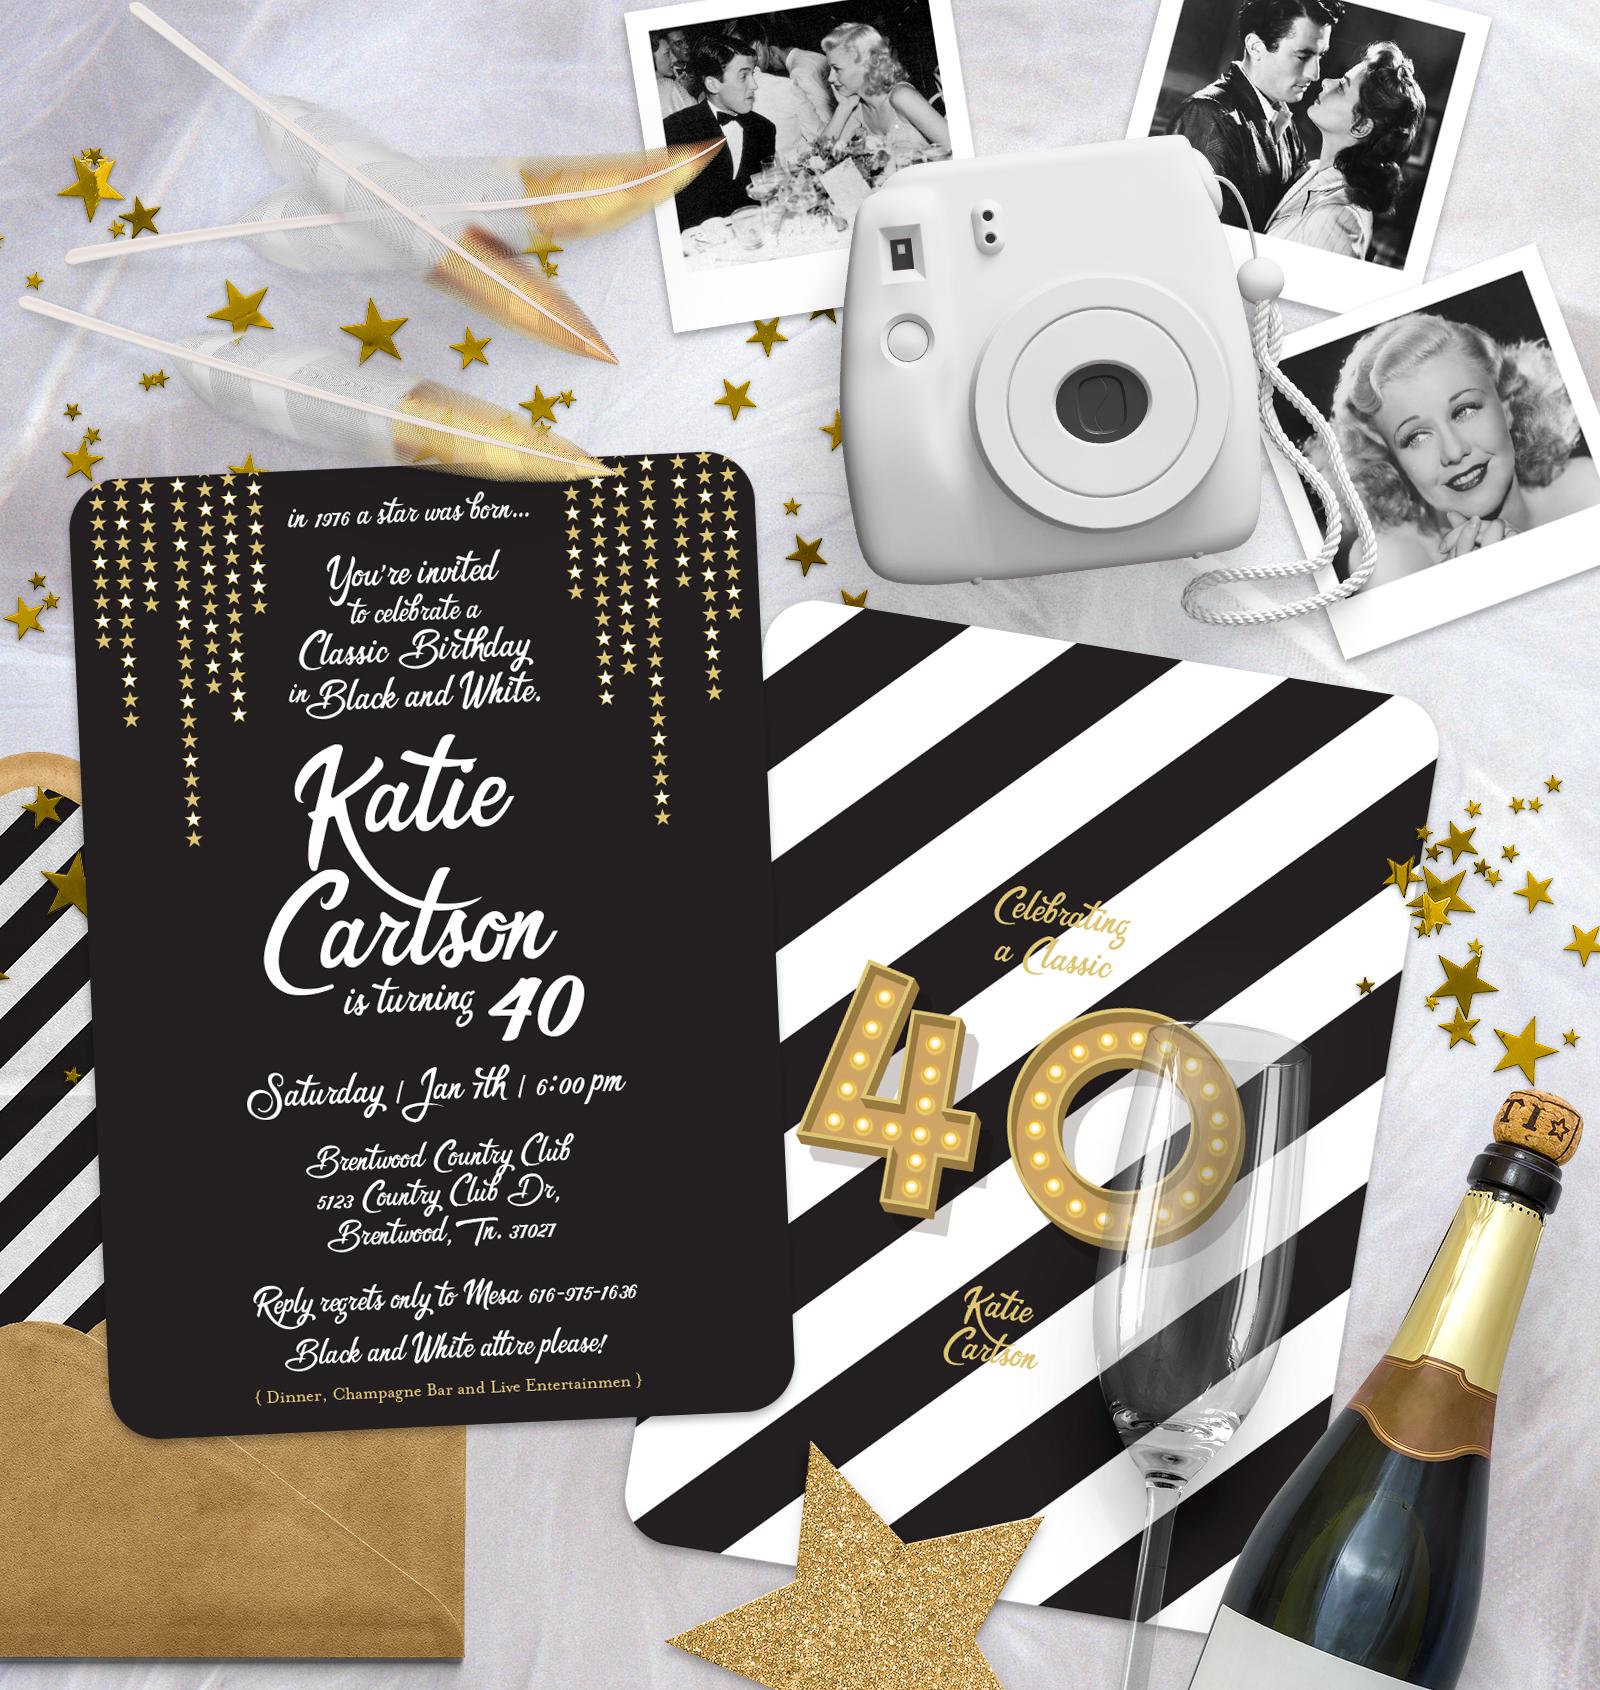 Katie's 40th Black and White Birthday Bash